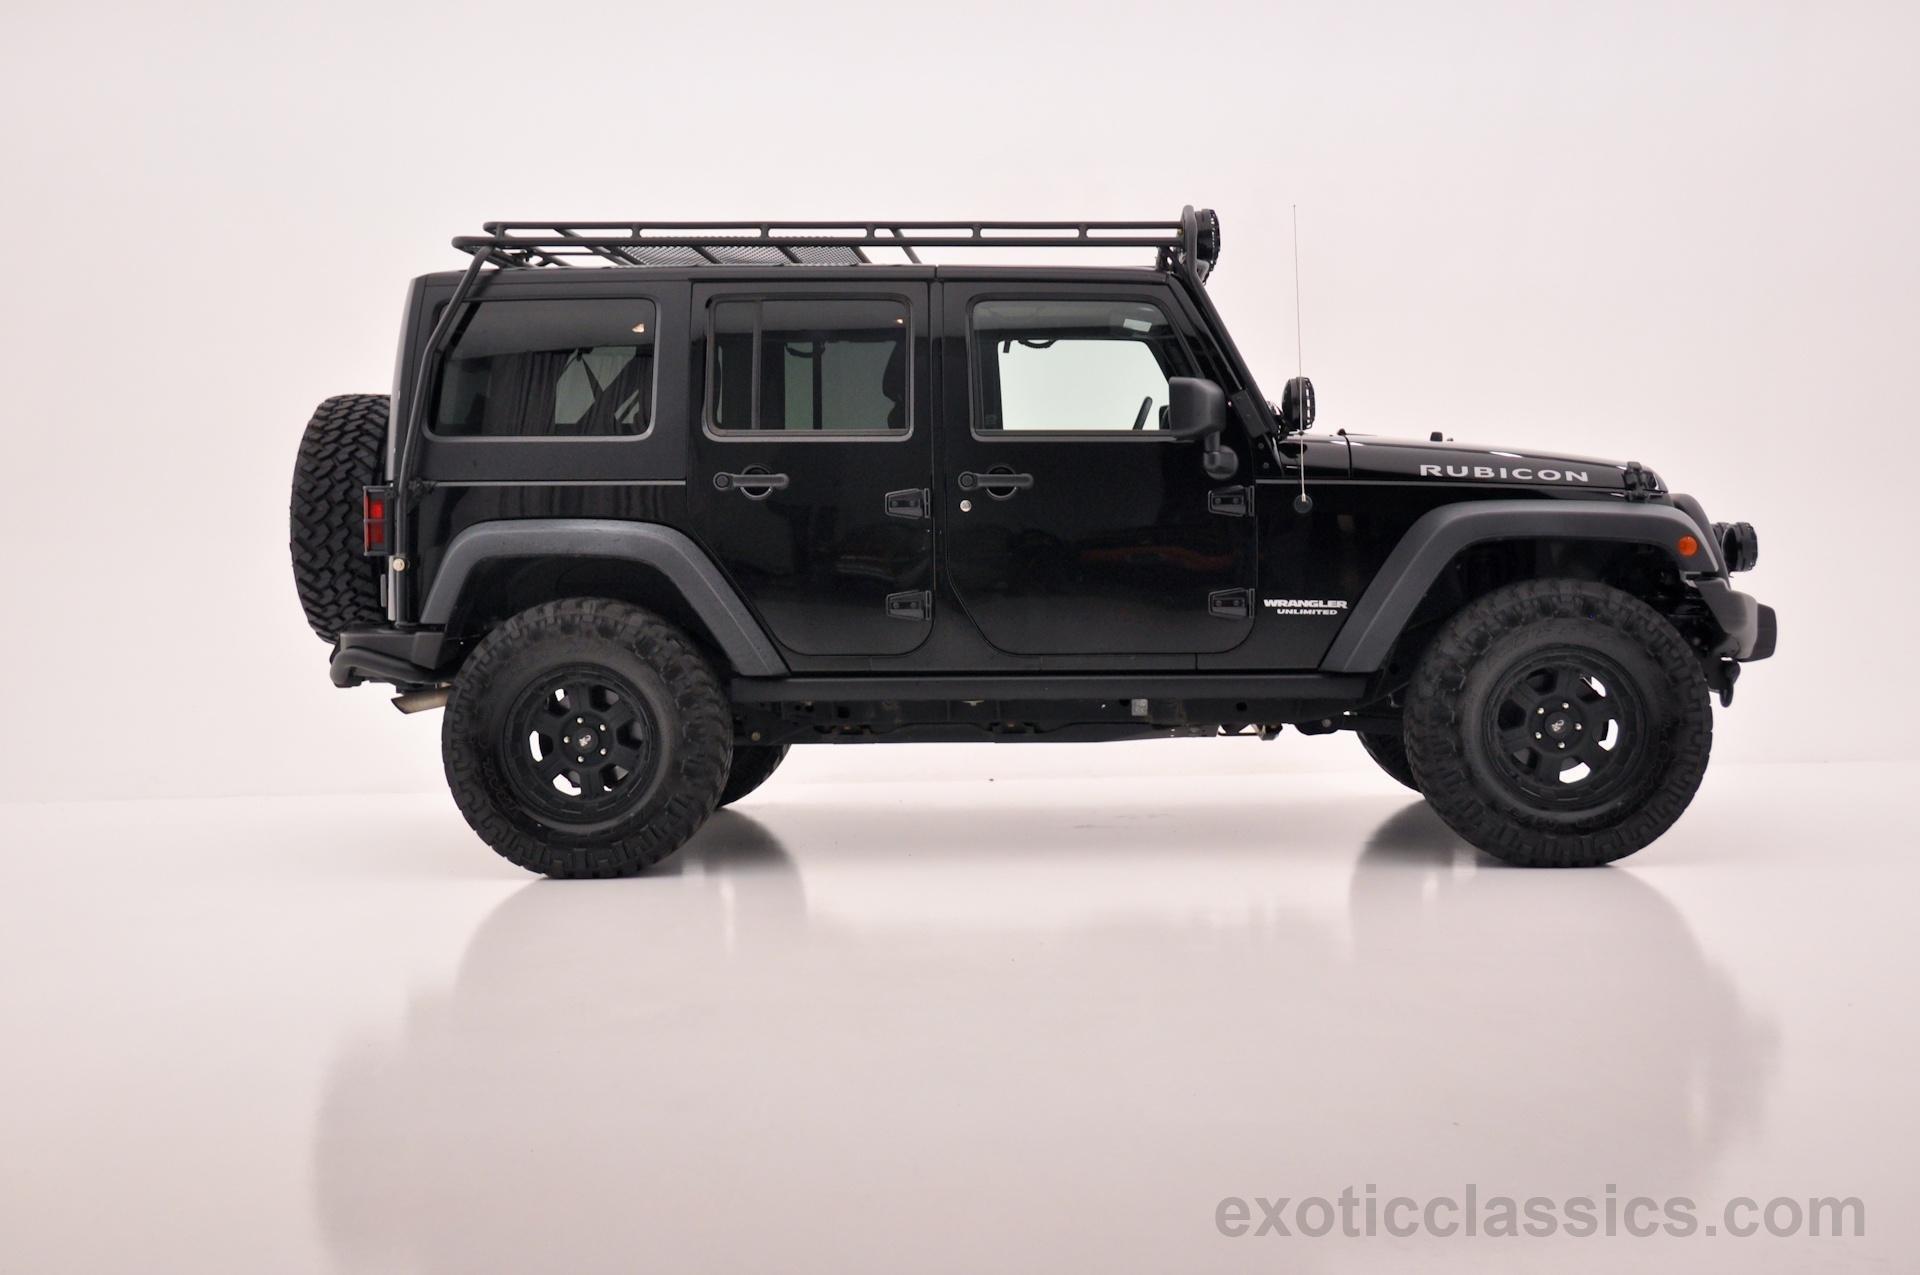 2011 jeep wrangler unlimited rubicon black 4wd all road 4x4 cars wallpaper 1920x1275 711426. Black Bedroom Furniture Sets. Home Design Ideas